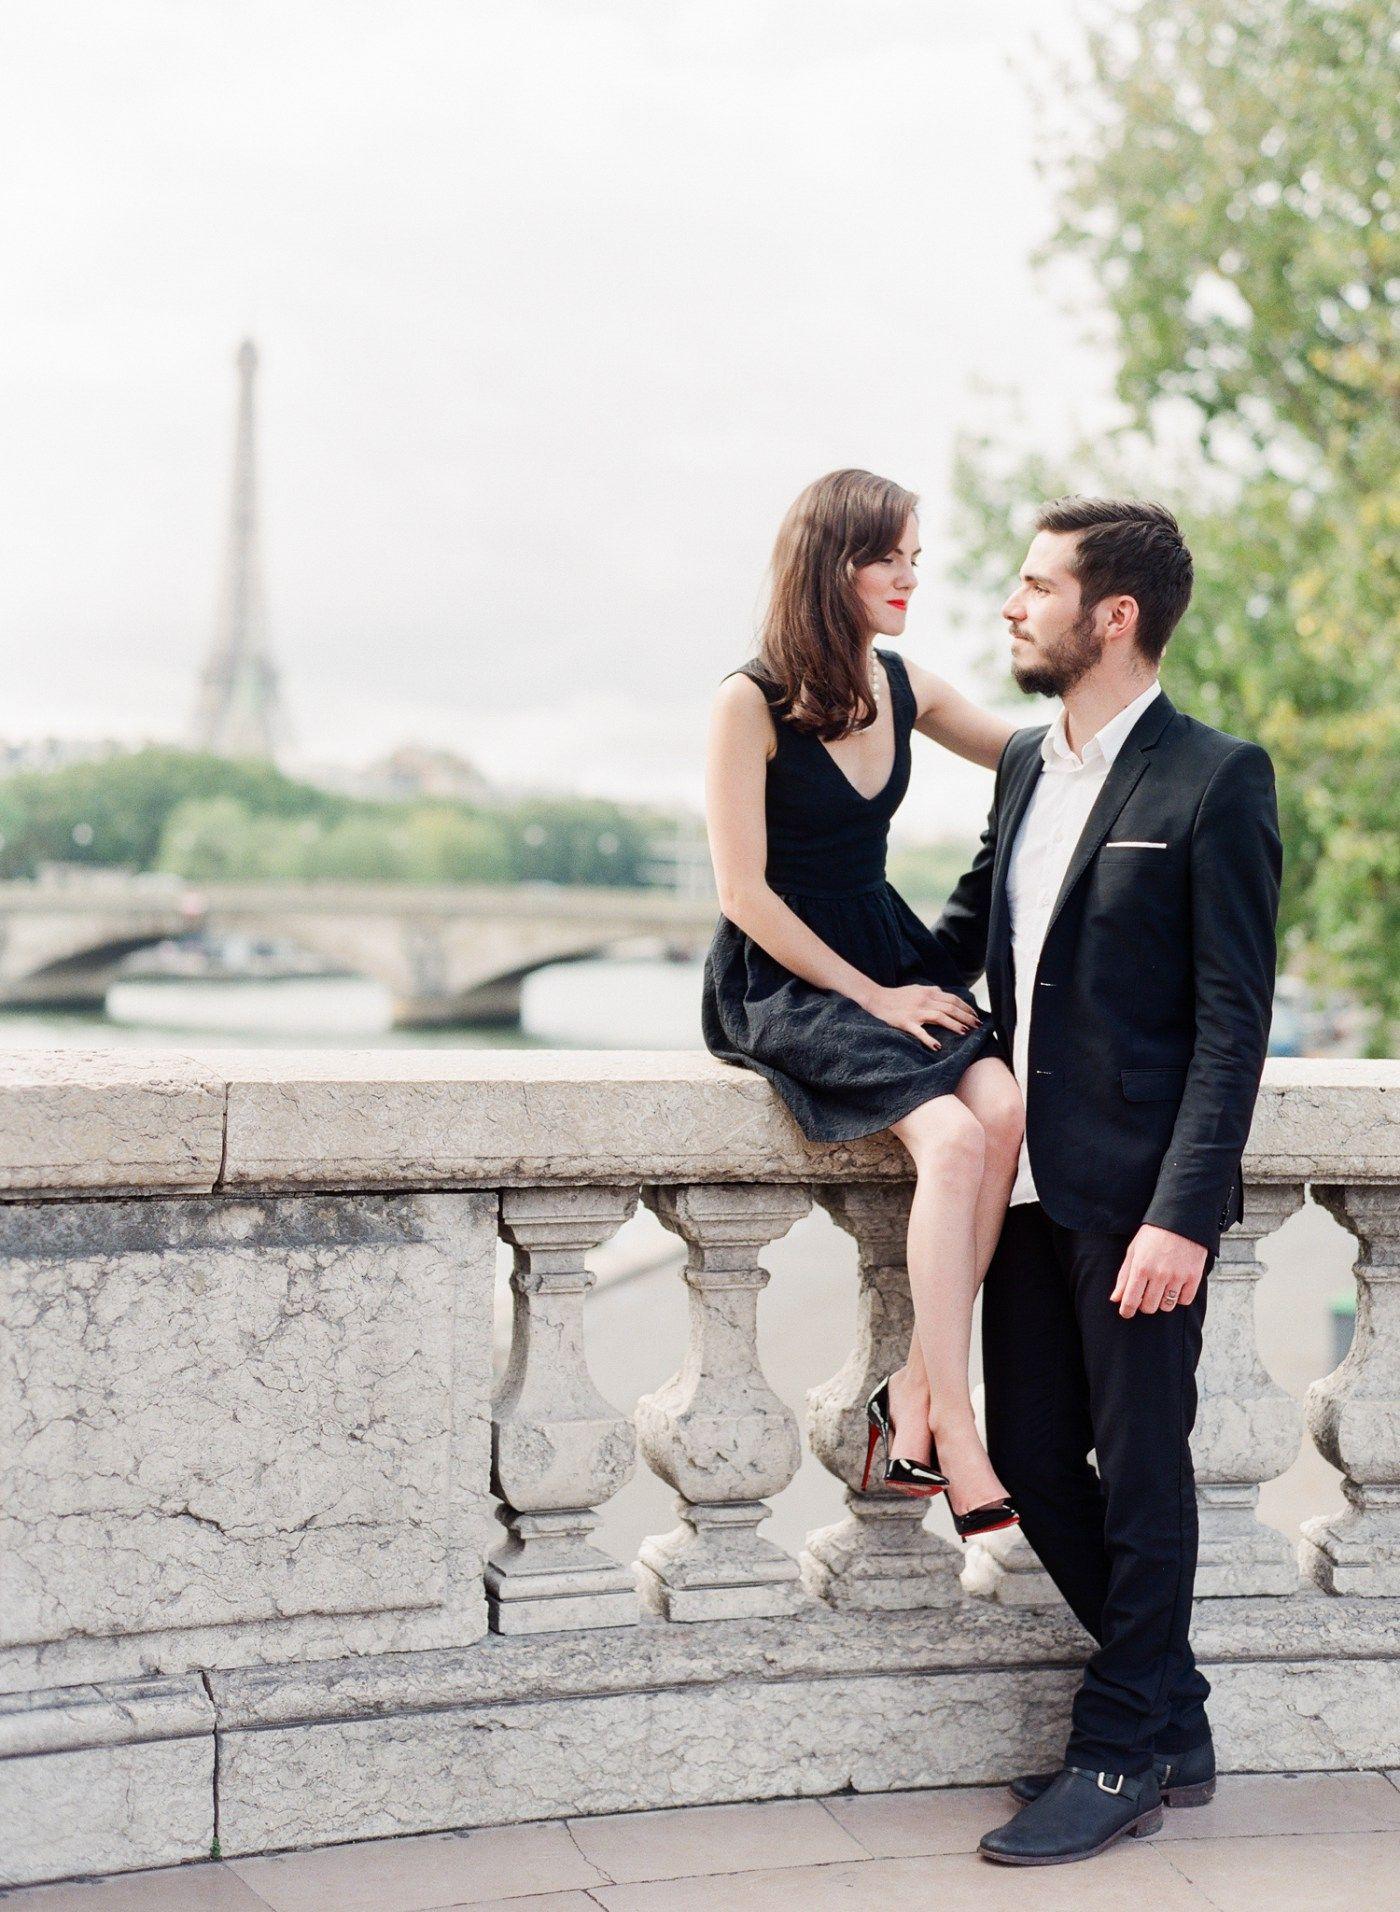 Black dress engagement photos - Engagement Paris Anniversary Session Pre Wedding Louboutin So Kate Little Black Dress Eiffel Tower Alexander Iii